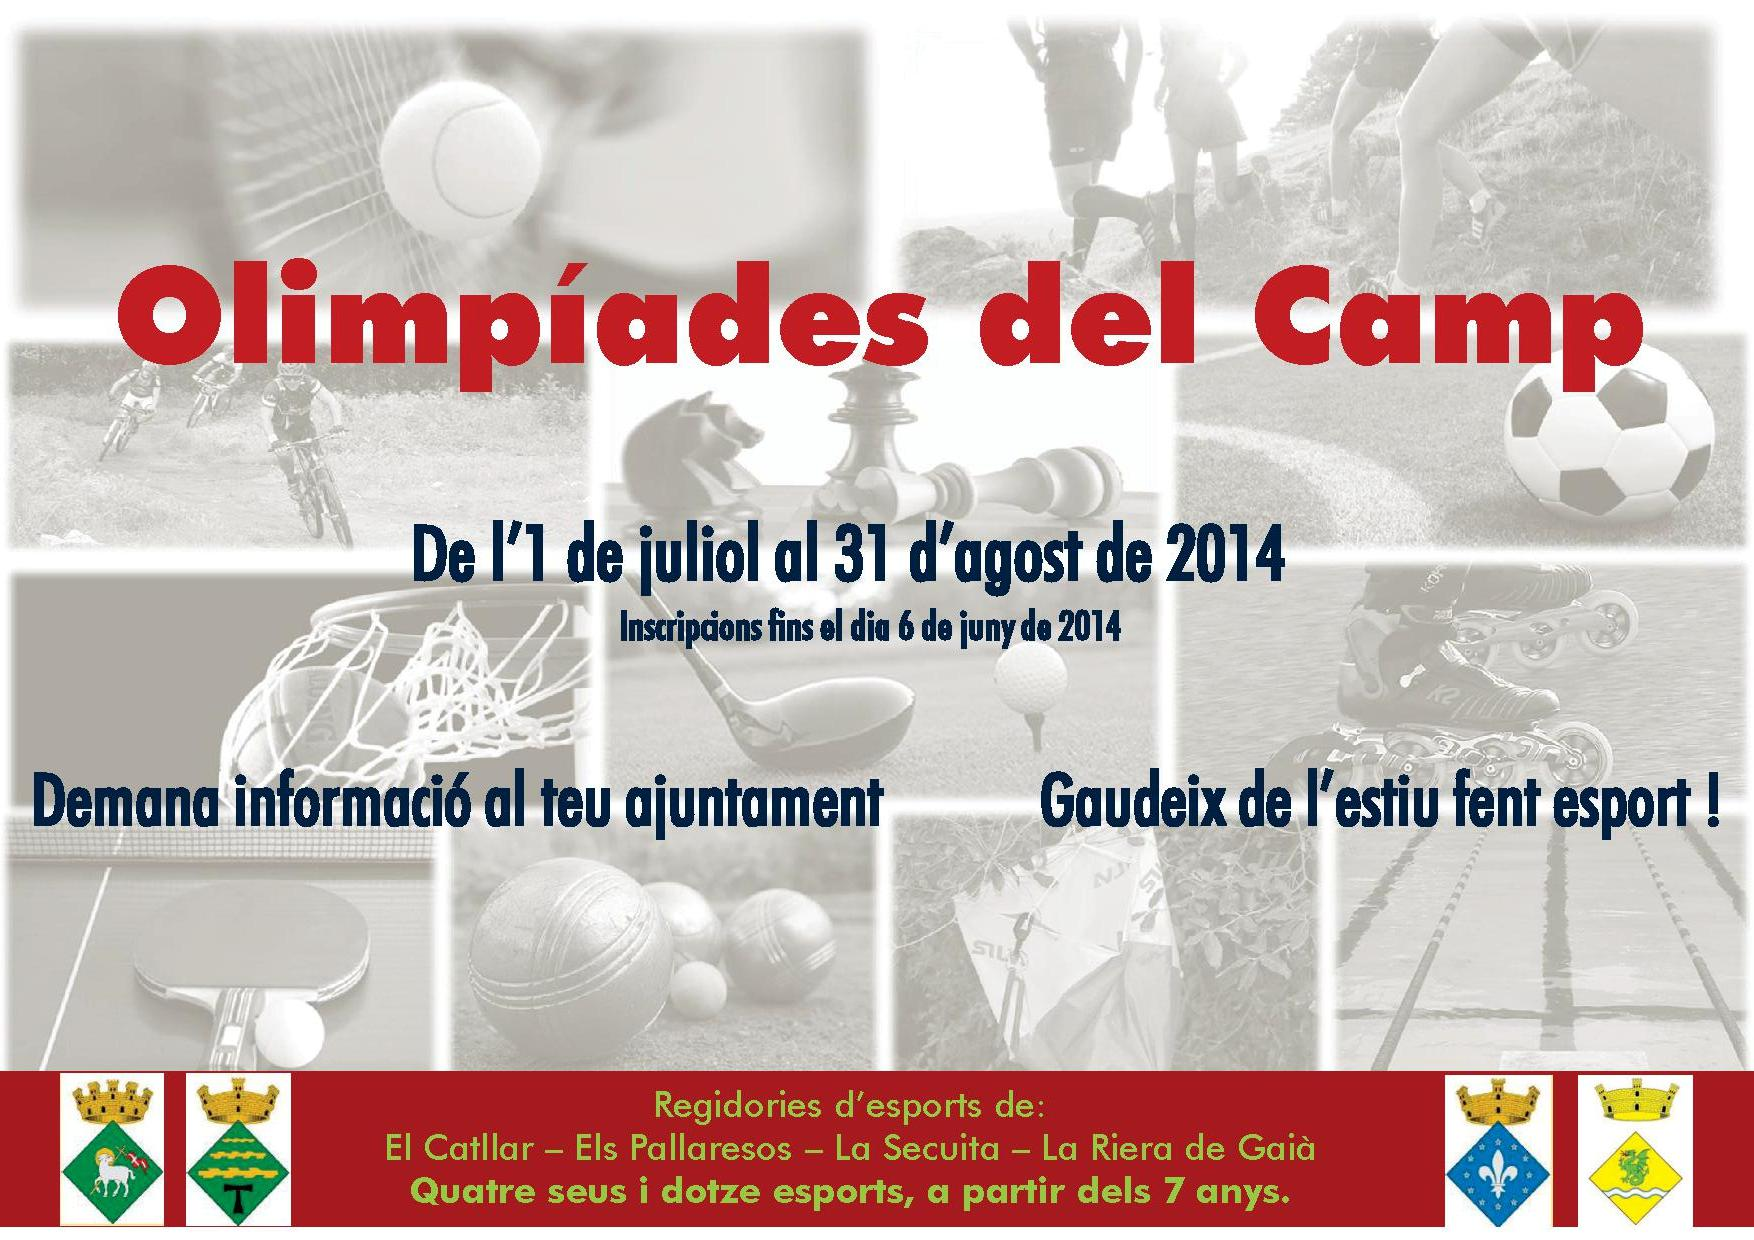 II OLIMPIADAS DEL CAMP